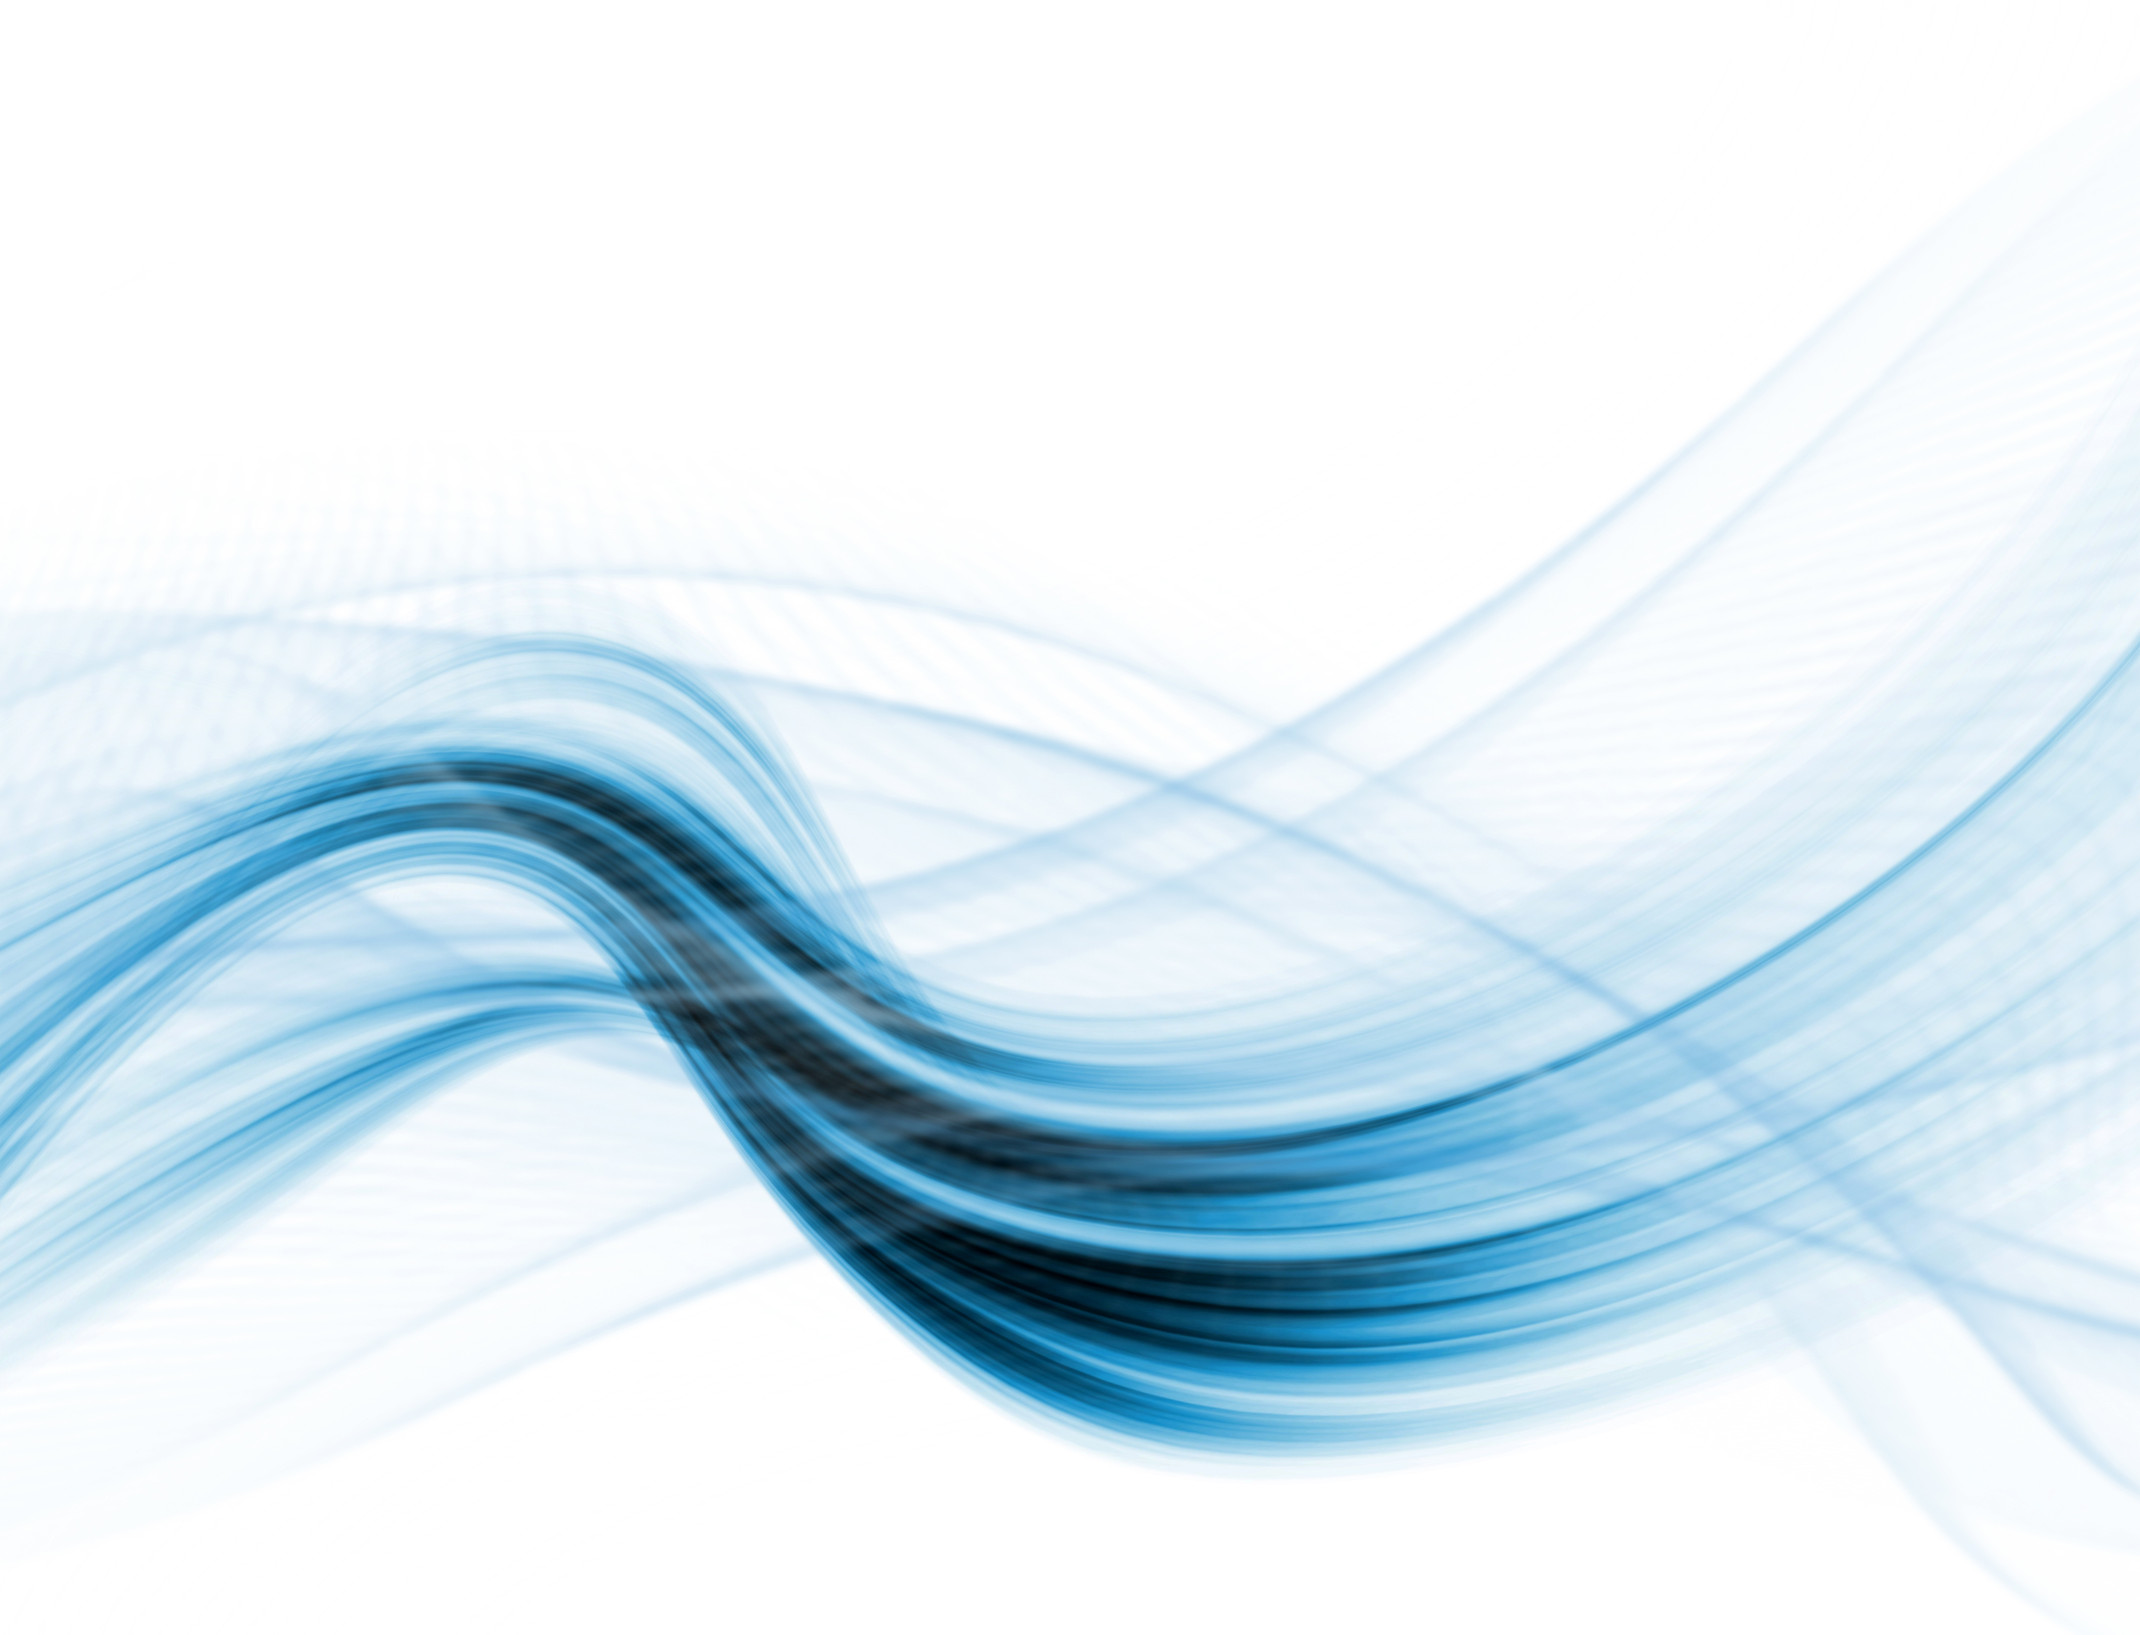 Free Blue Swoosh Png, Download Free Clip Art, Free Clip Art.